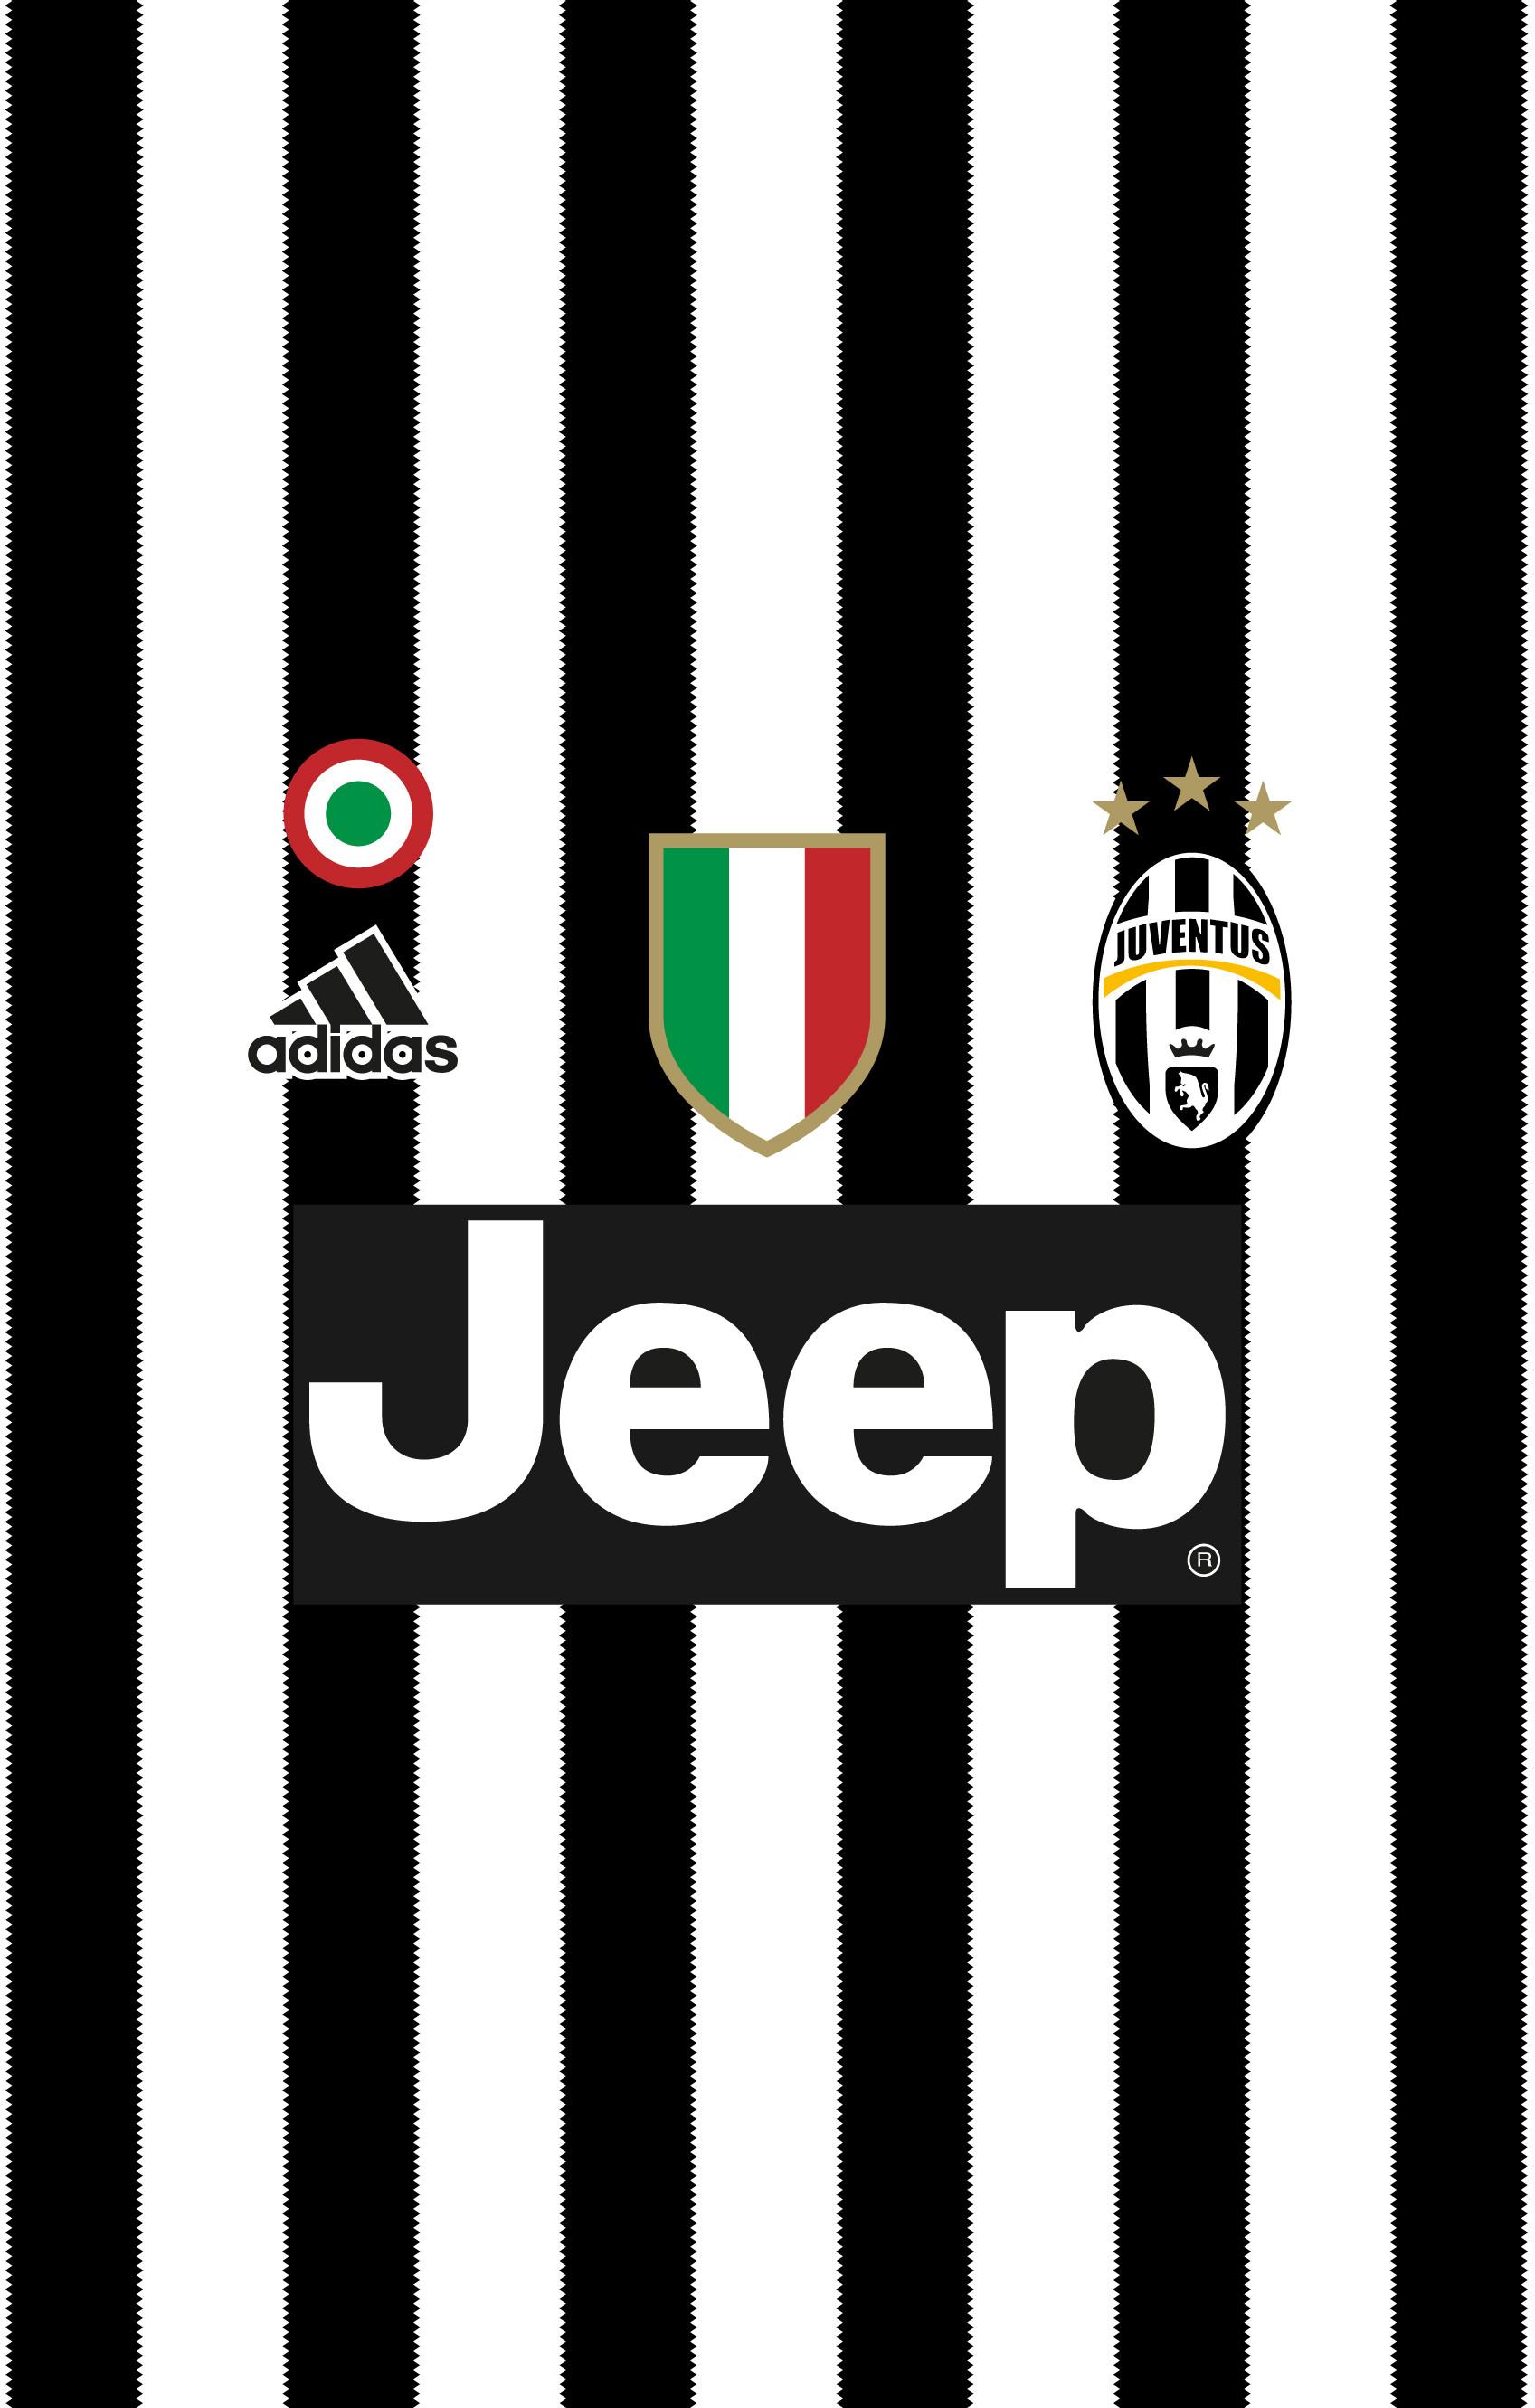 Juventus Sfondi 81 Immagini